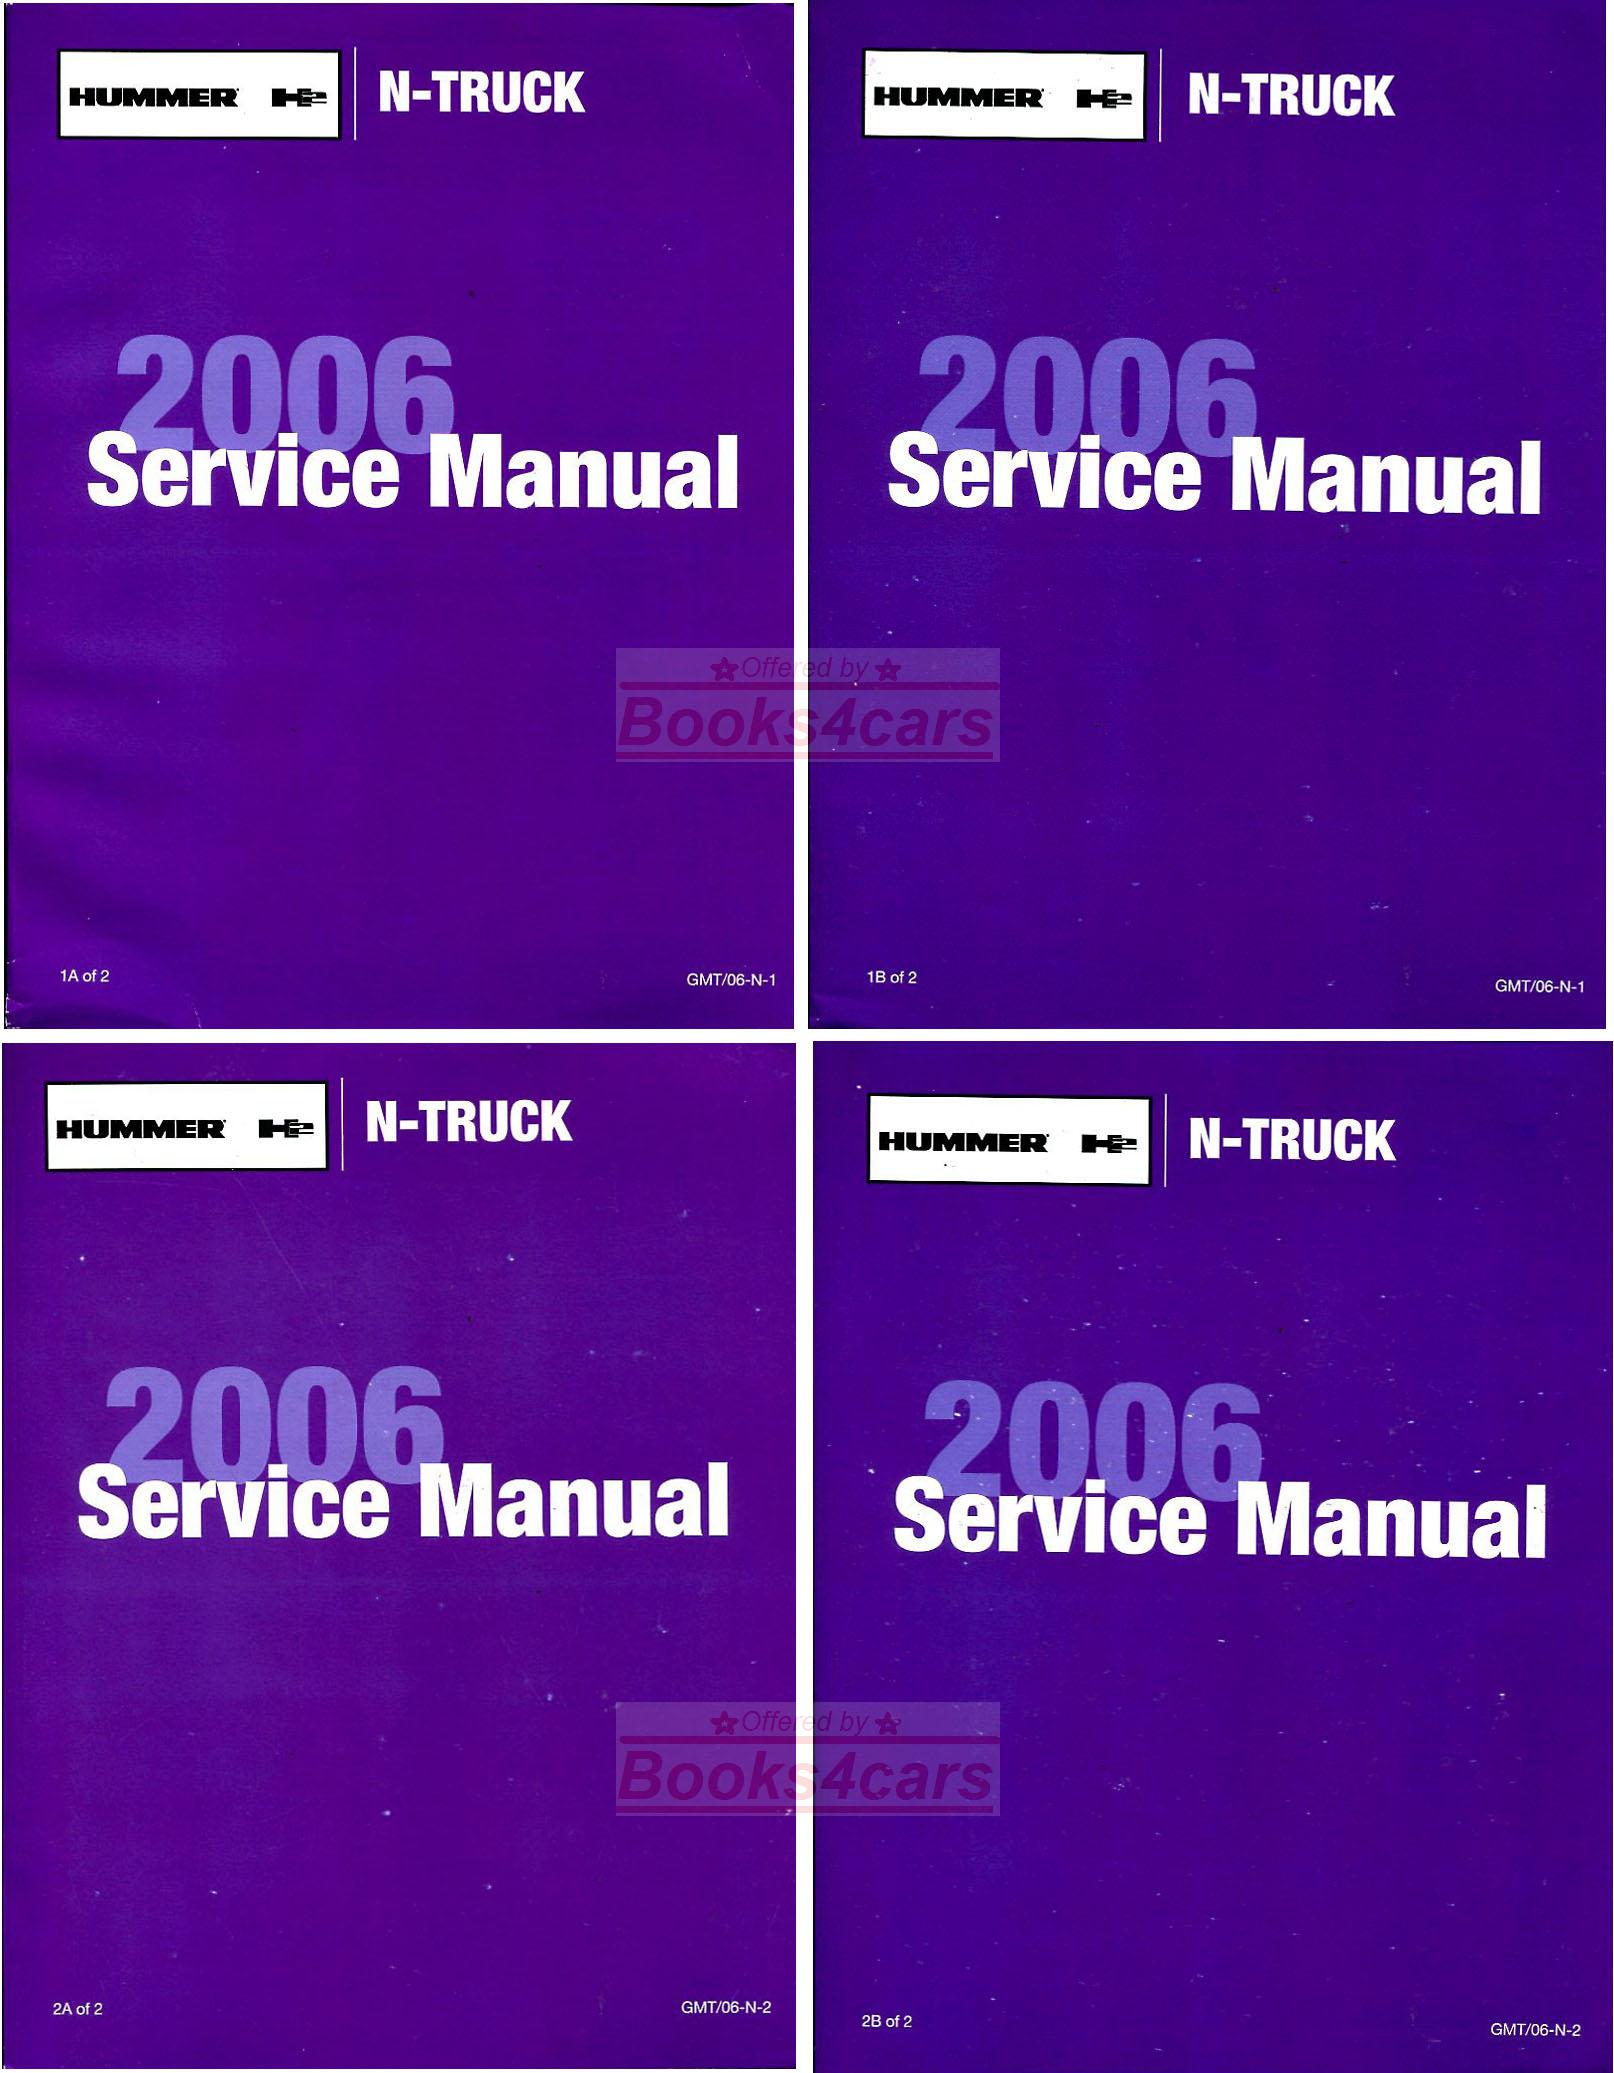 Hummer Shop Manual Digital Meter Wiring Diagram Emprendedor Link On Amp 2009 H3 Fuse Box Schematics Wiper 2006 Array Manuals At Books4cars Com Rh